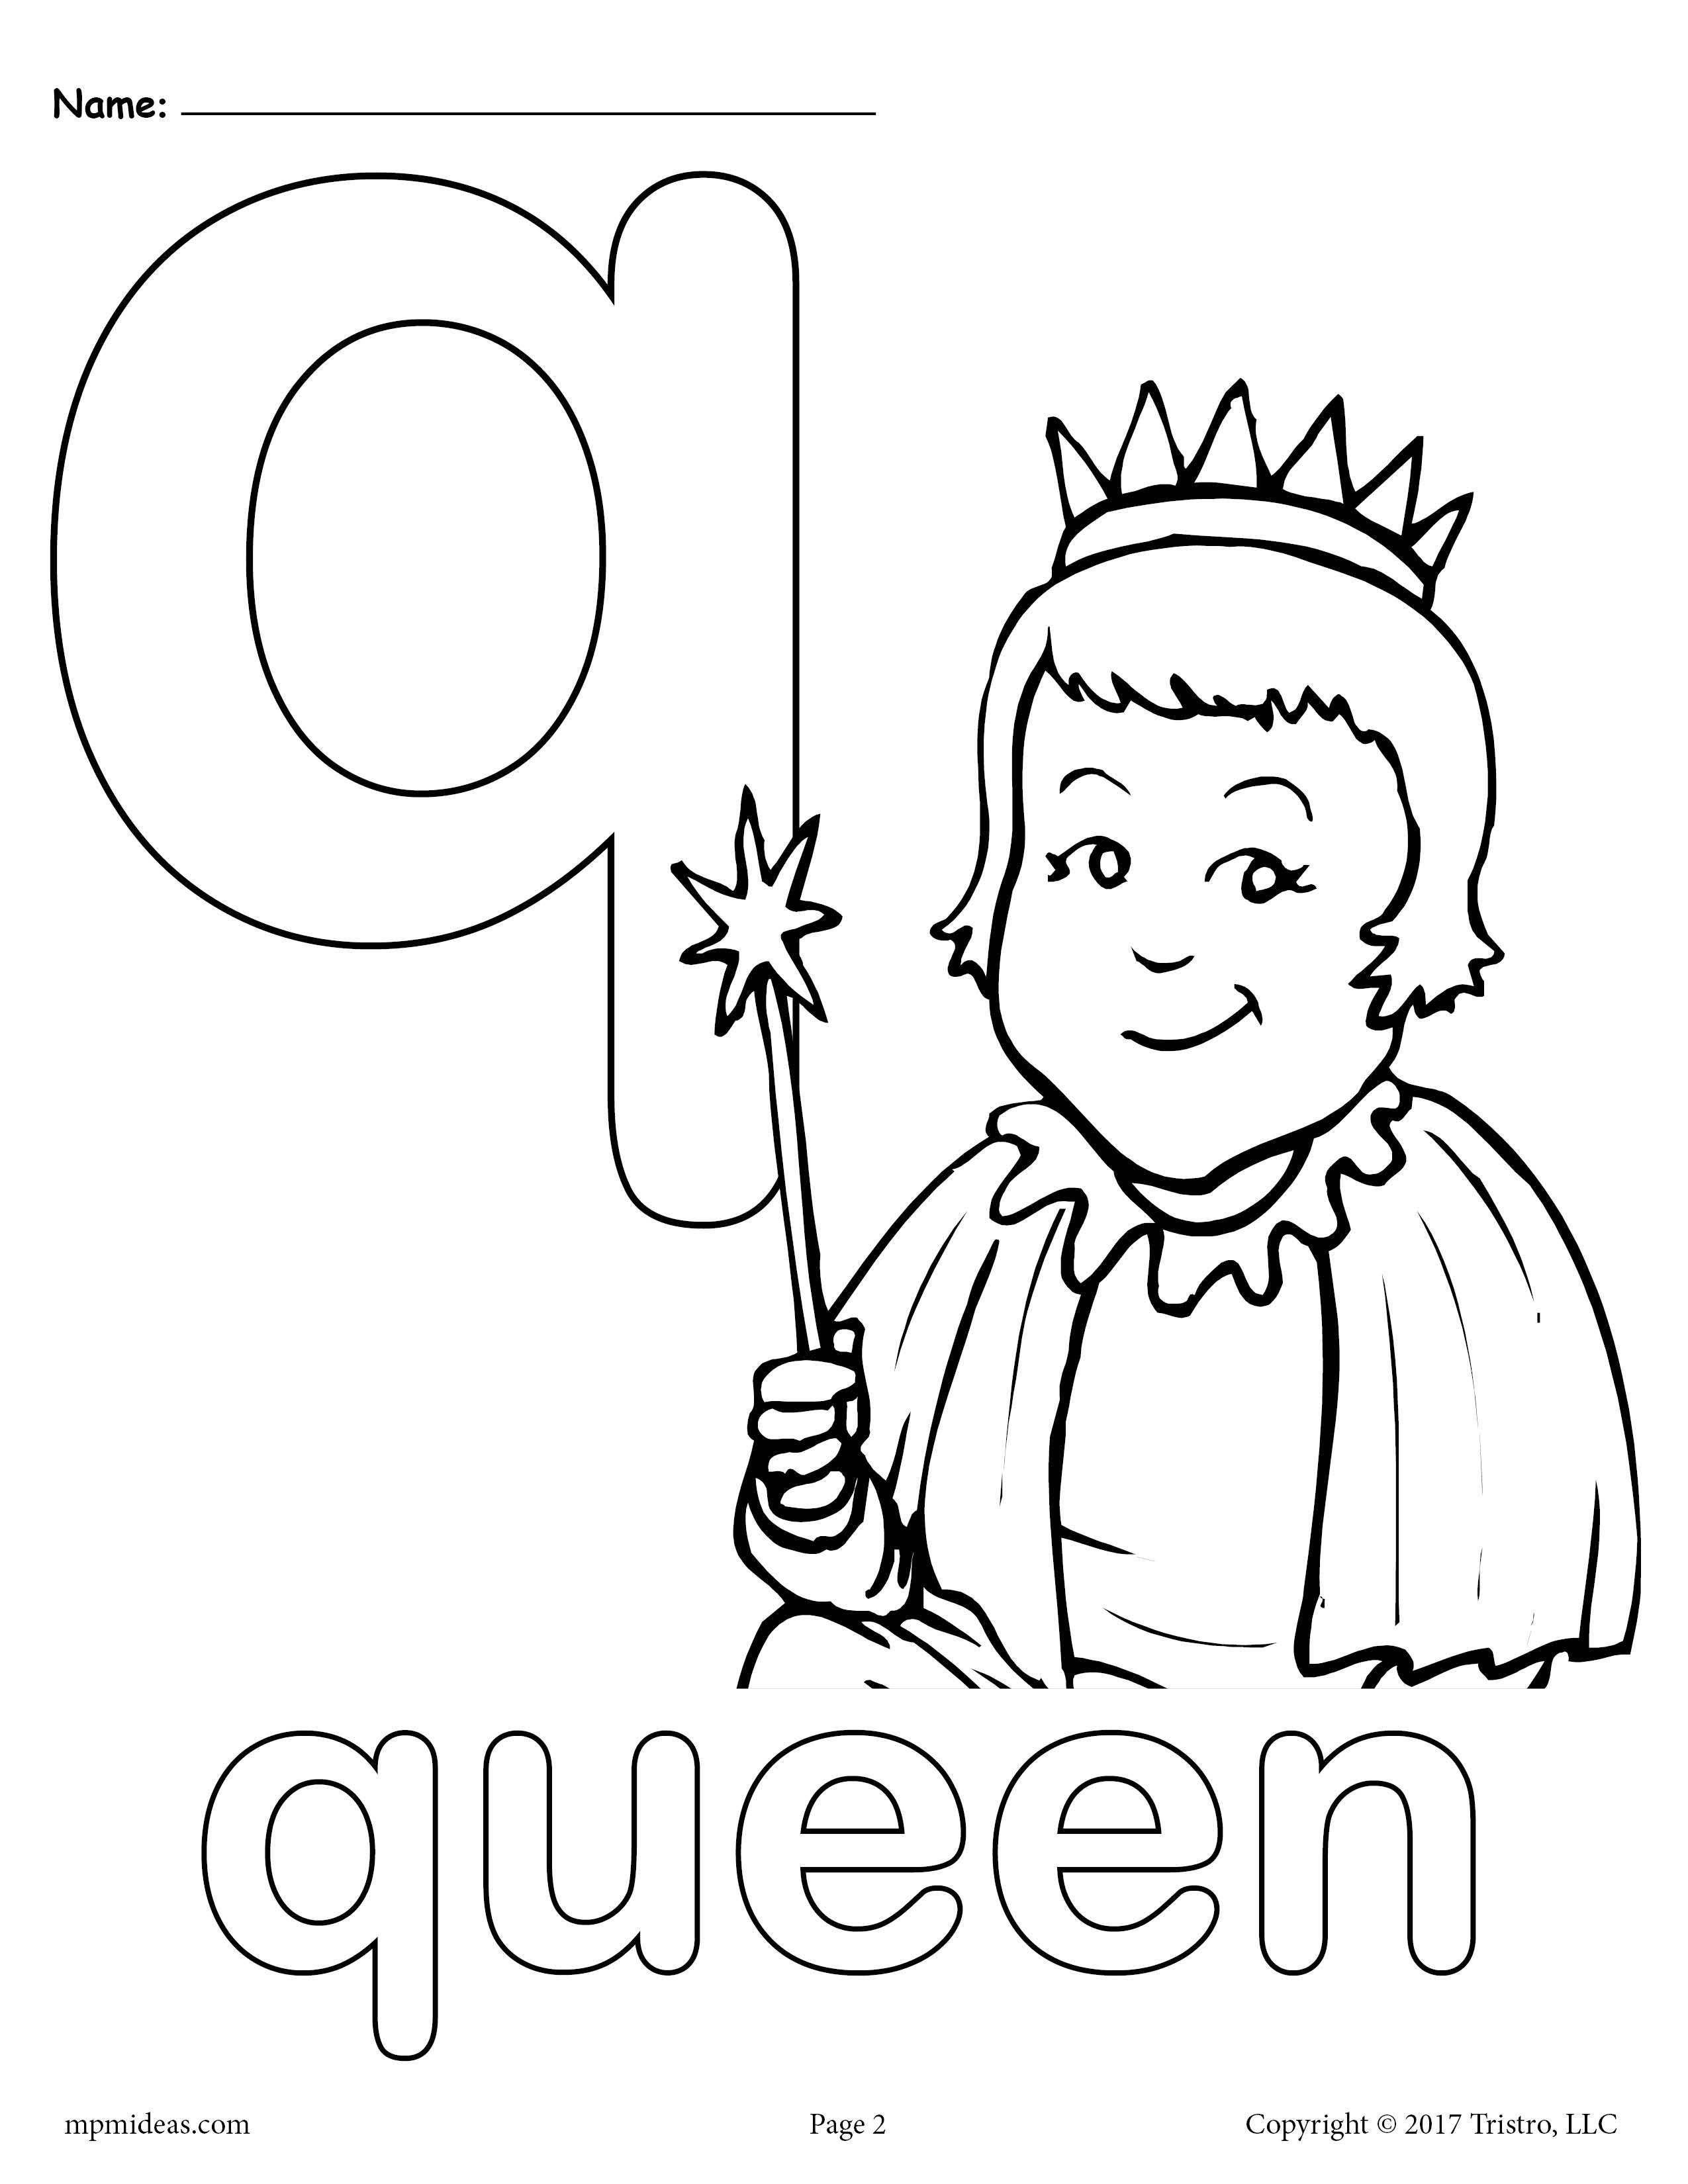 Letter Q Alphabet Coloring Pages 3 Printable Versions In 2021 Letter A Coloring Pages Alphabet Coloring Pages Alphabet Coloring